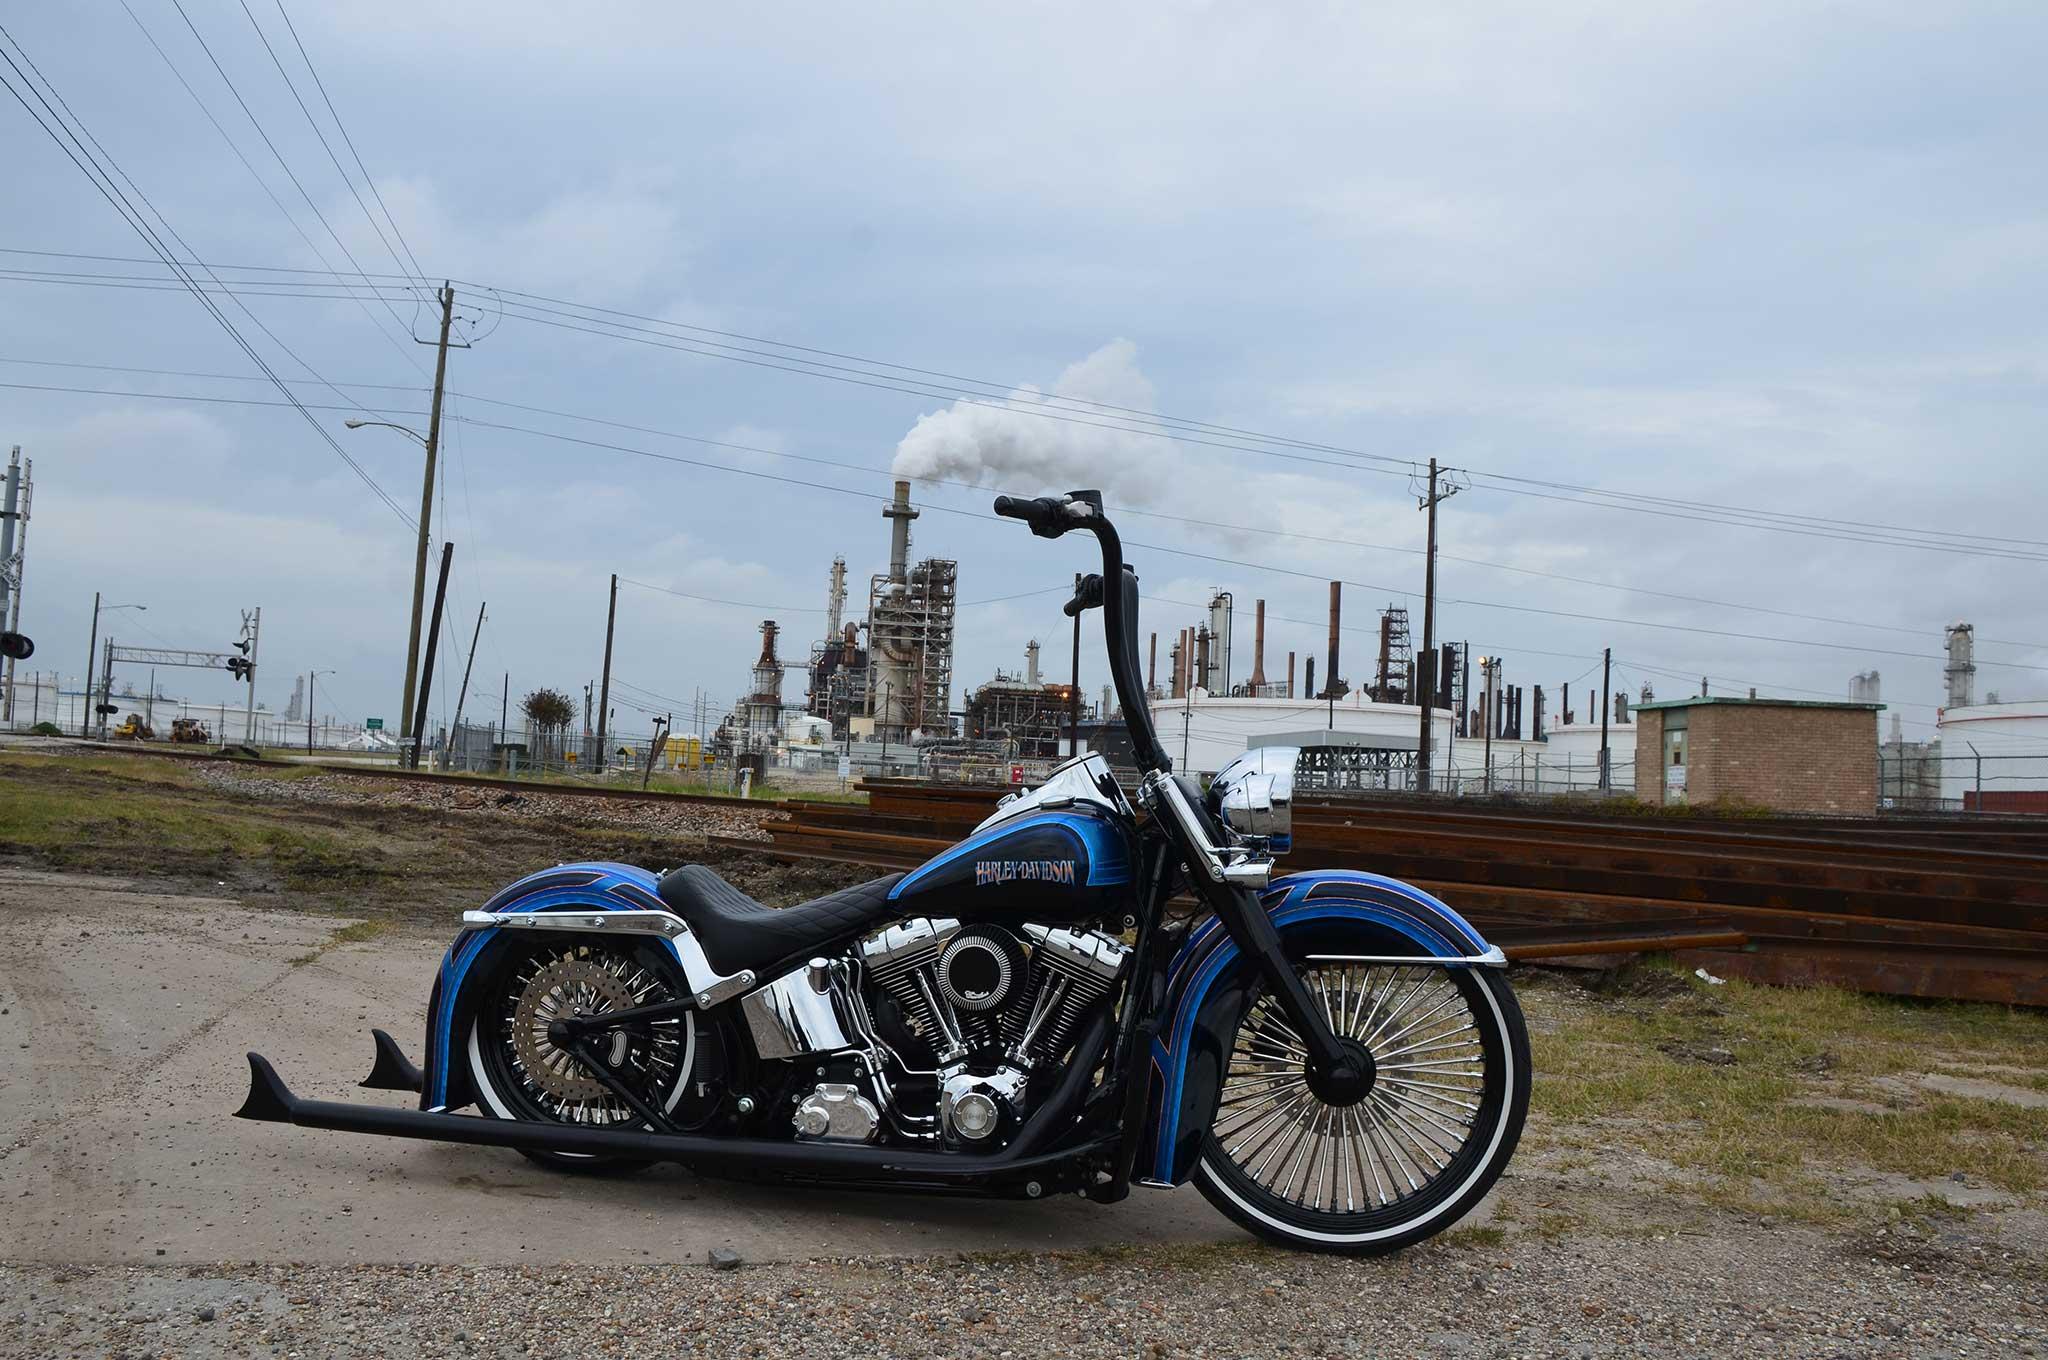 Softail Deluxe Harley Davidson